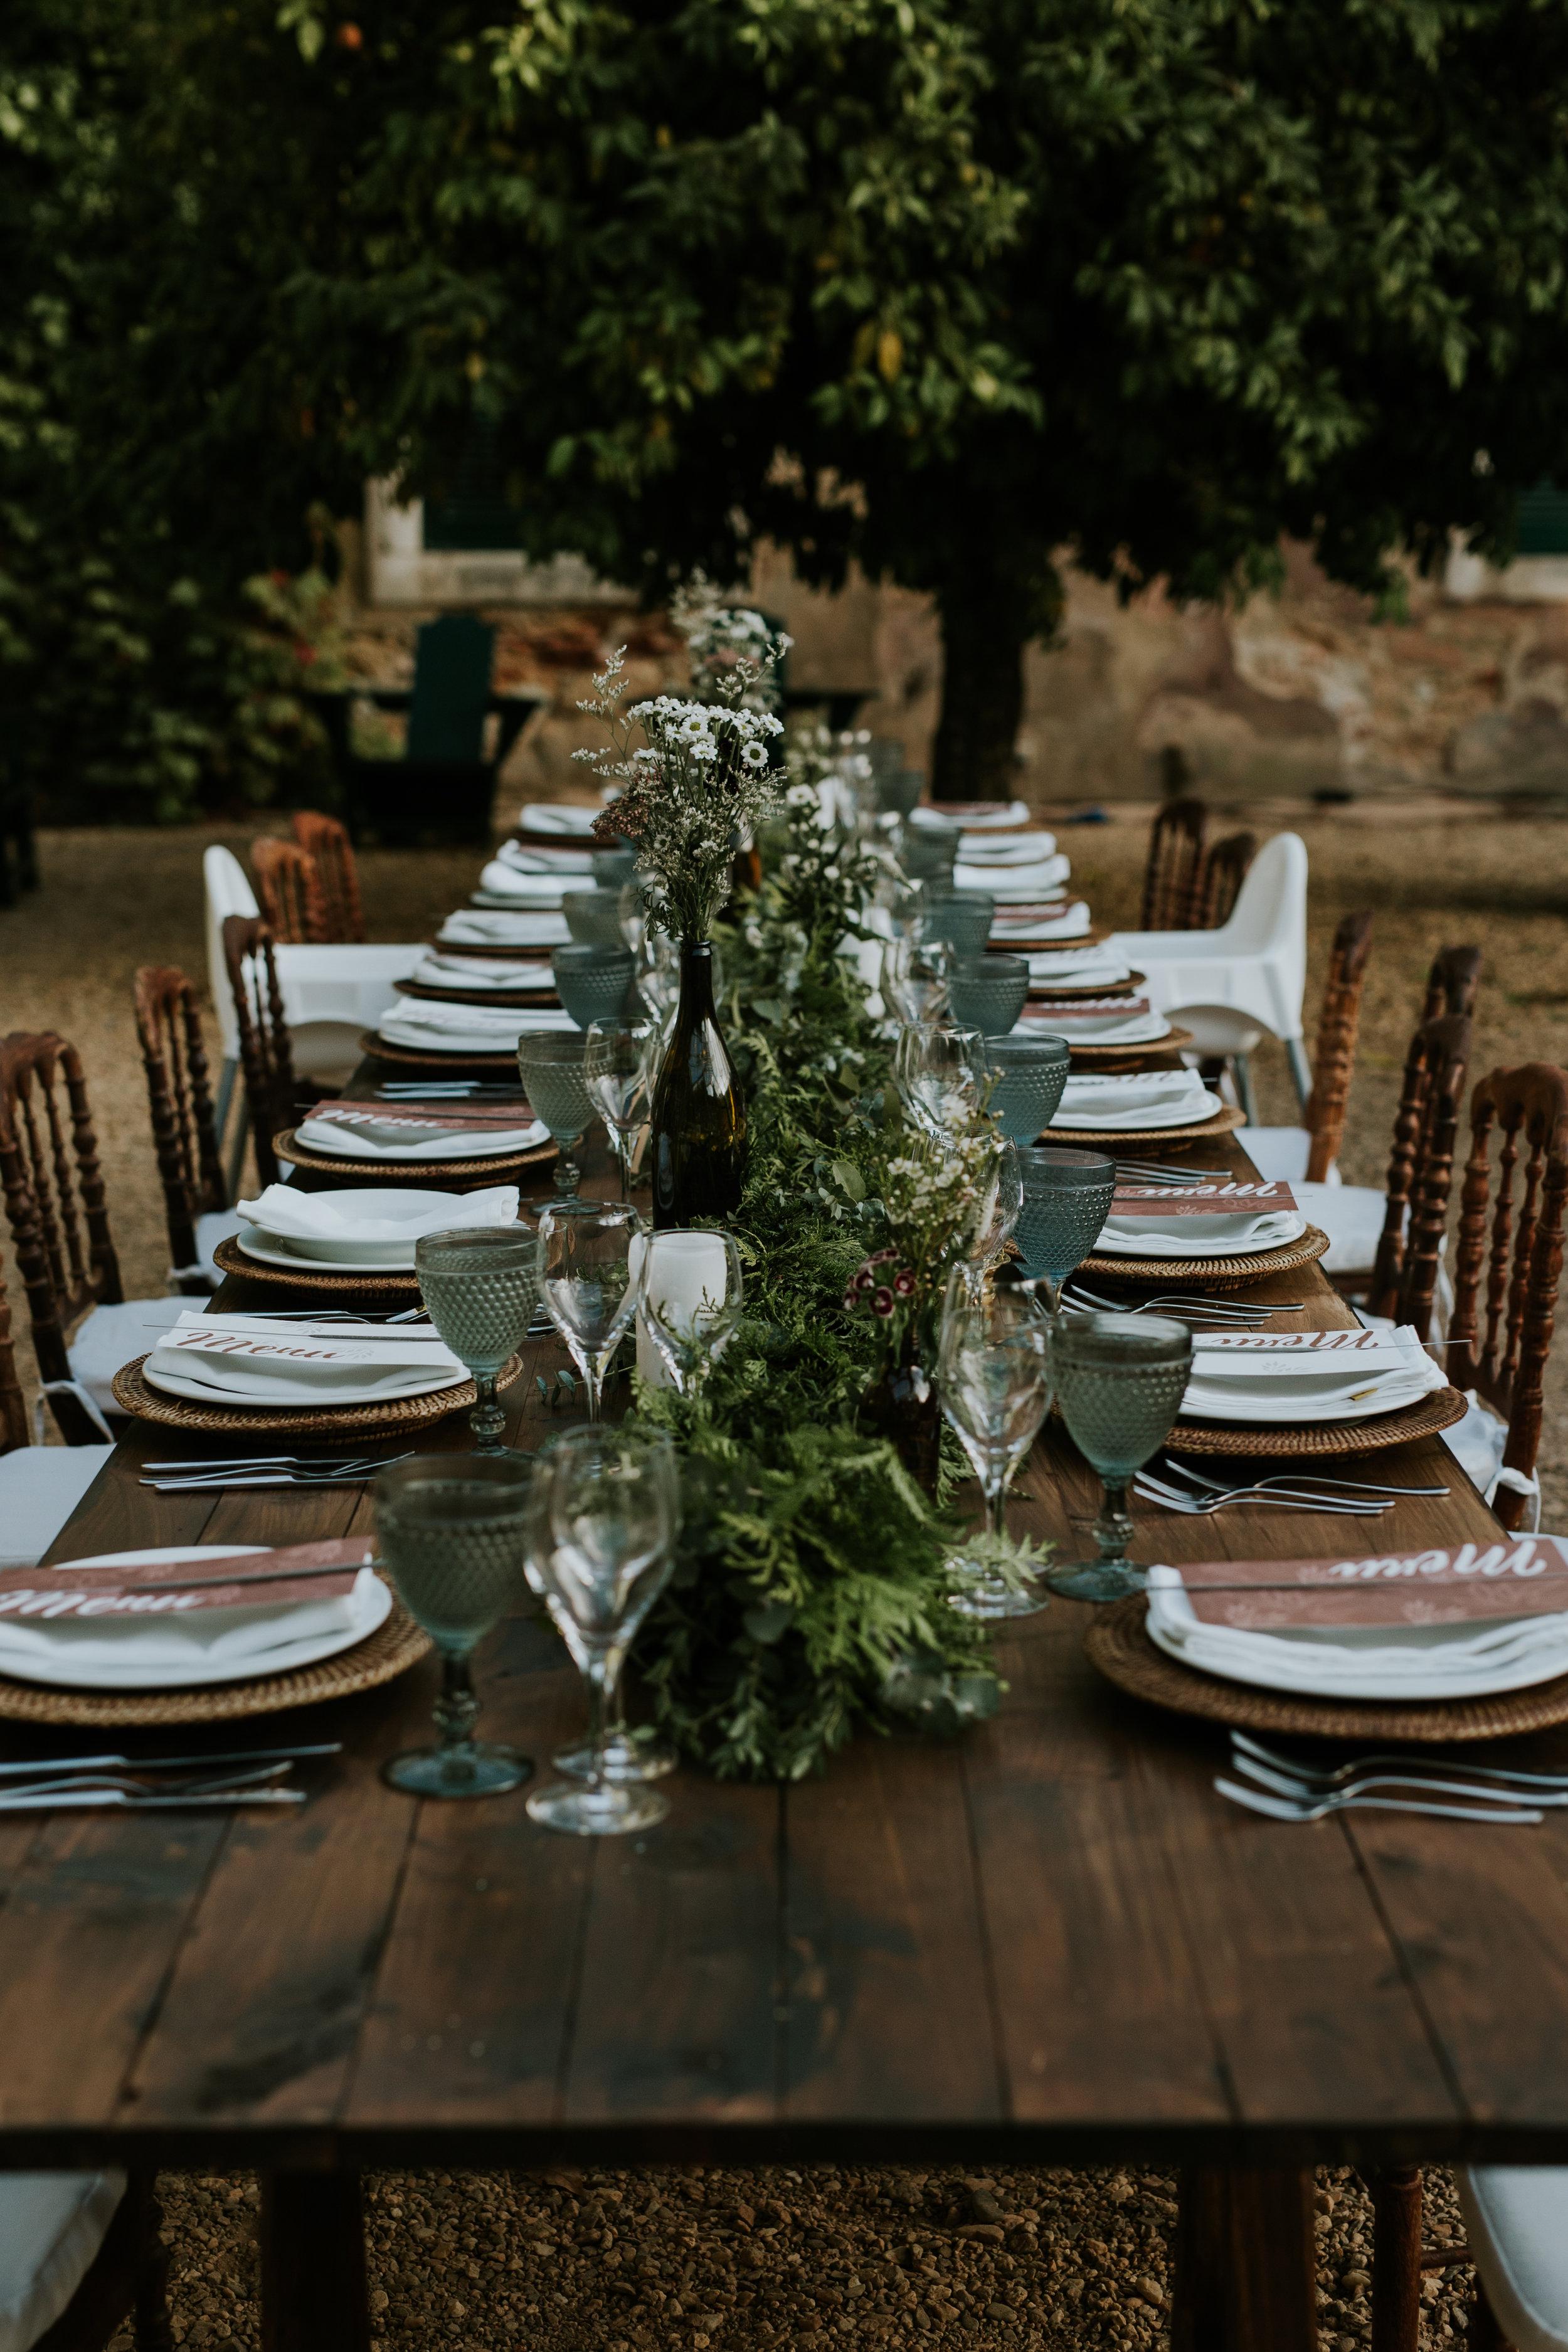 006_09 setembro 2017_ wedding_in_azeitao_portugal.jpg